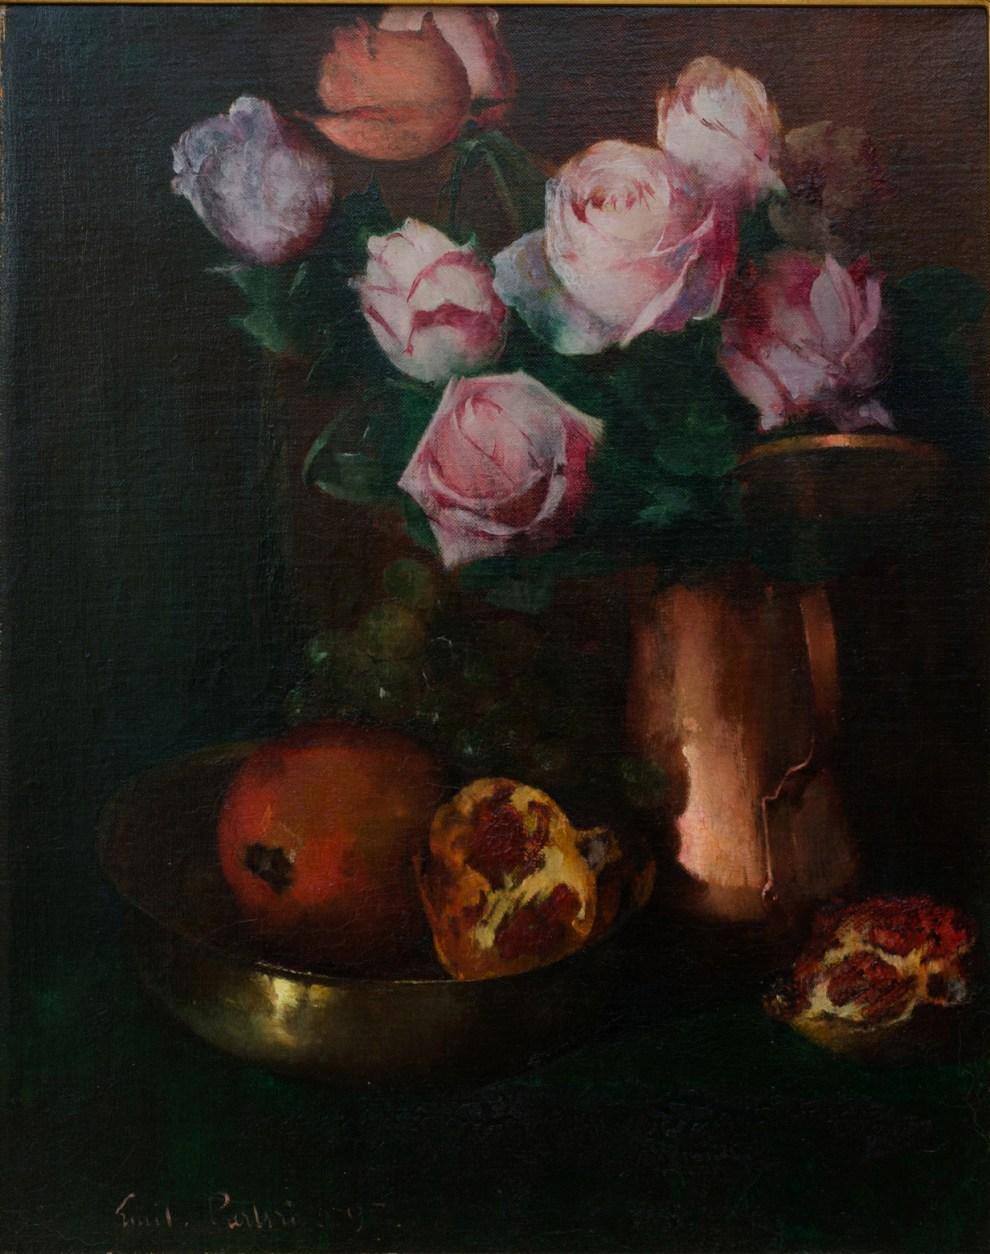 Emil Carlsen : Roses in a copper jar, 1897.